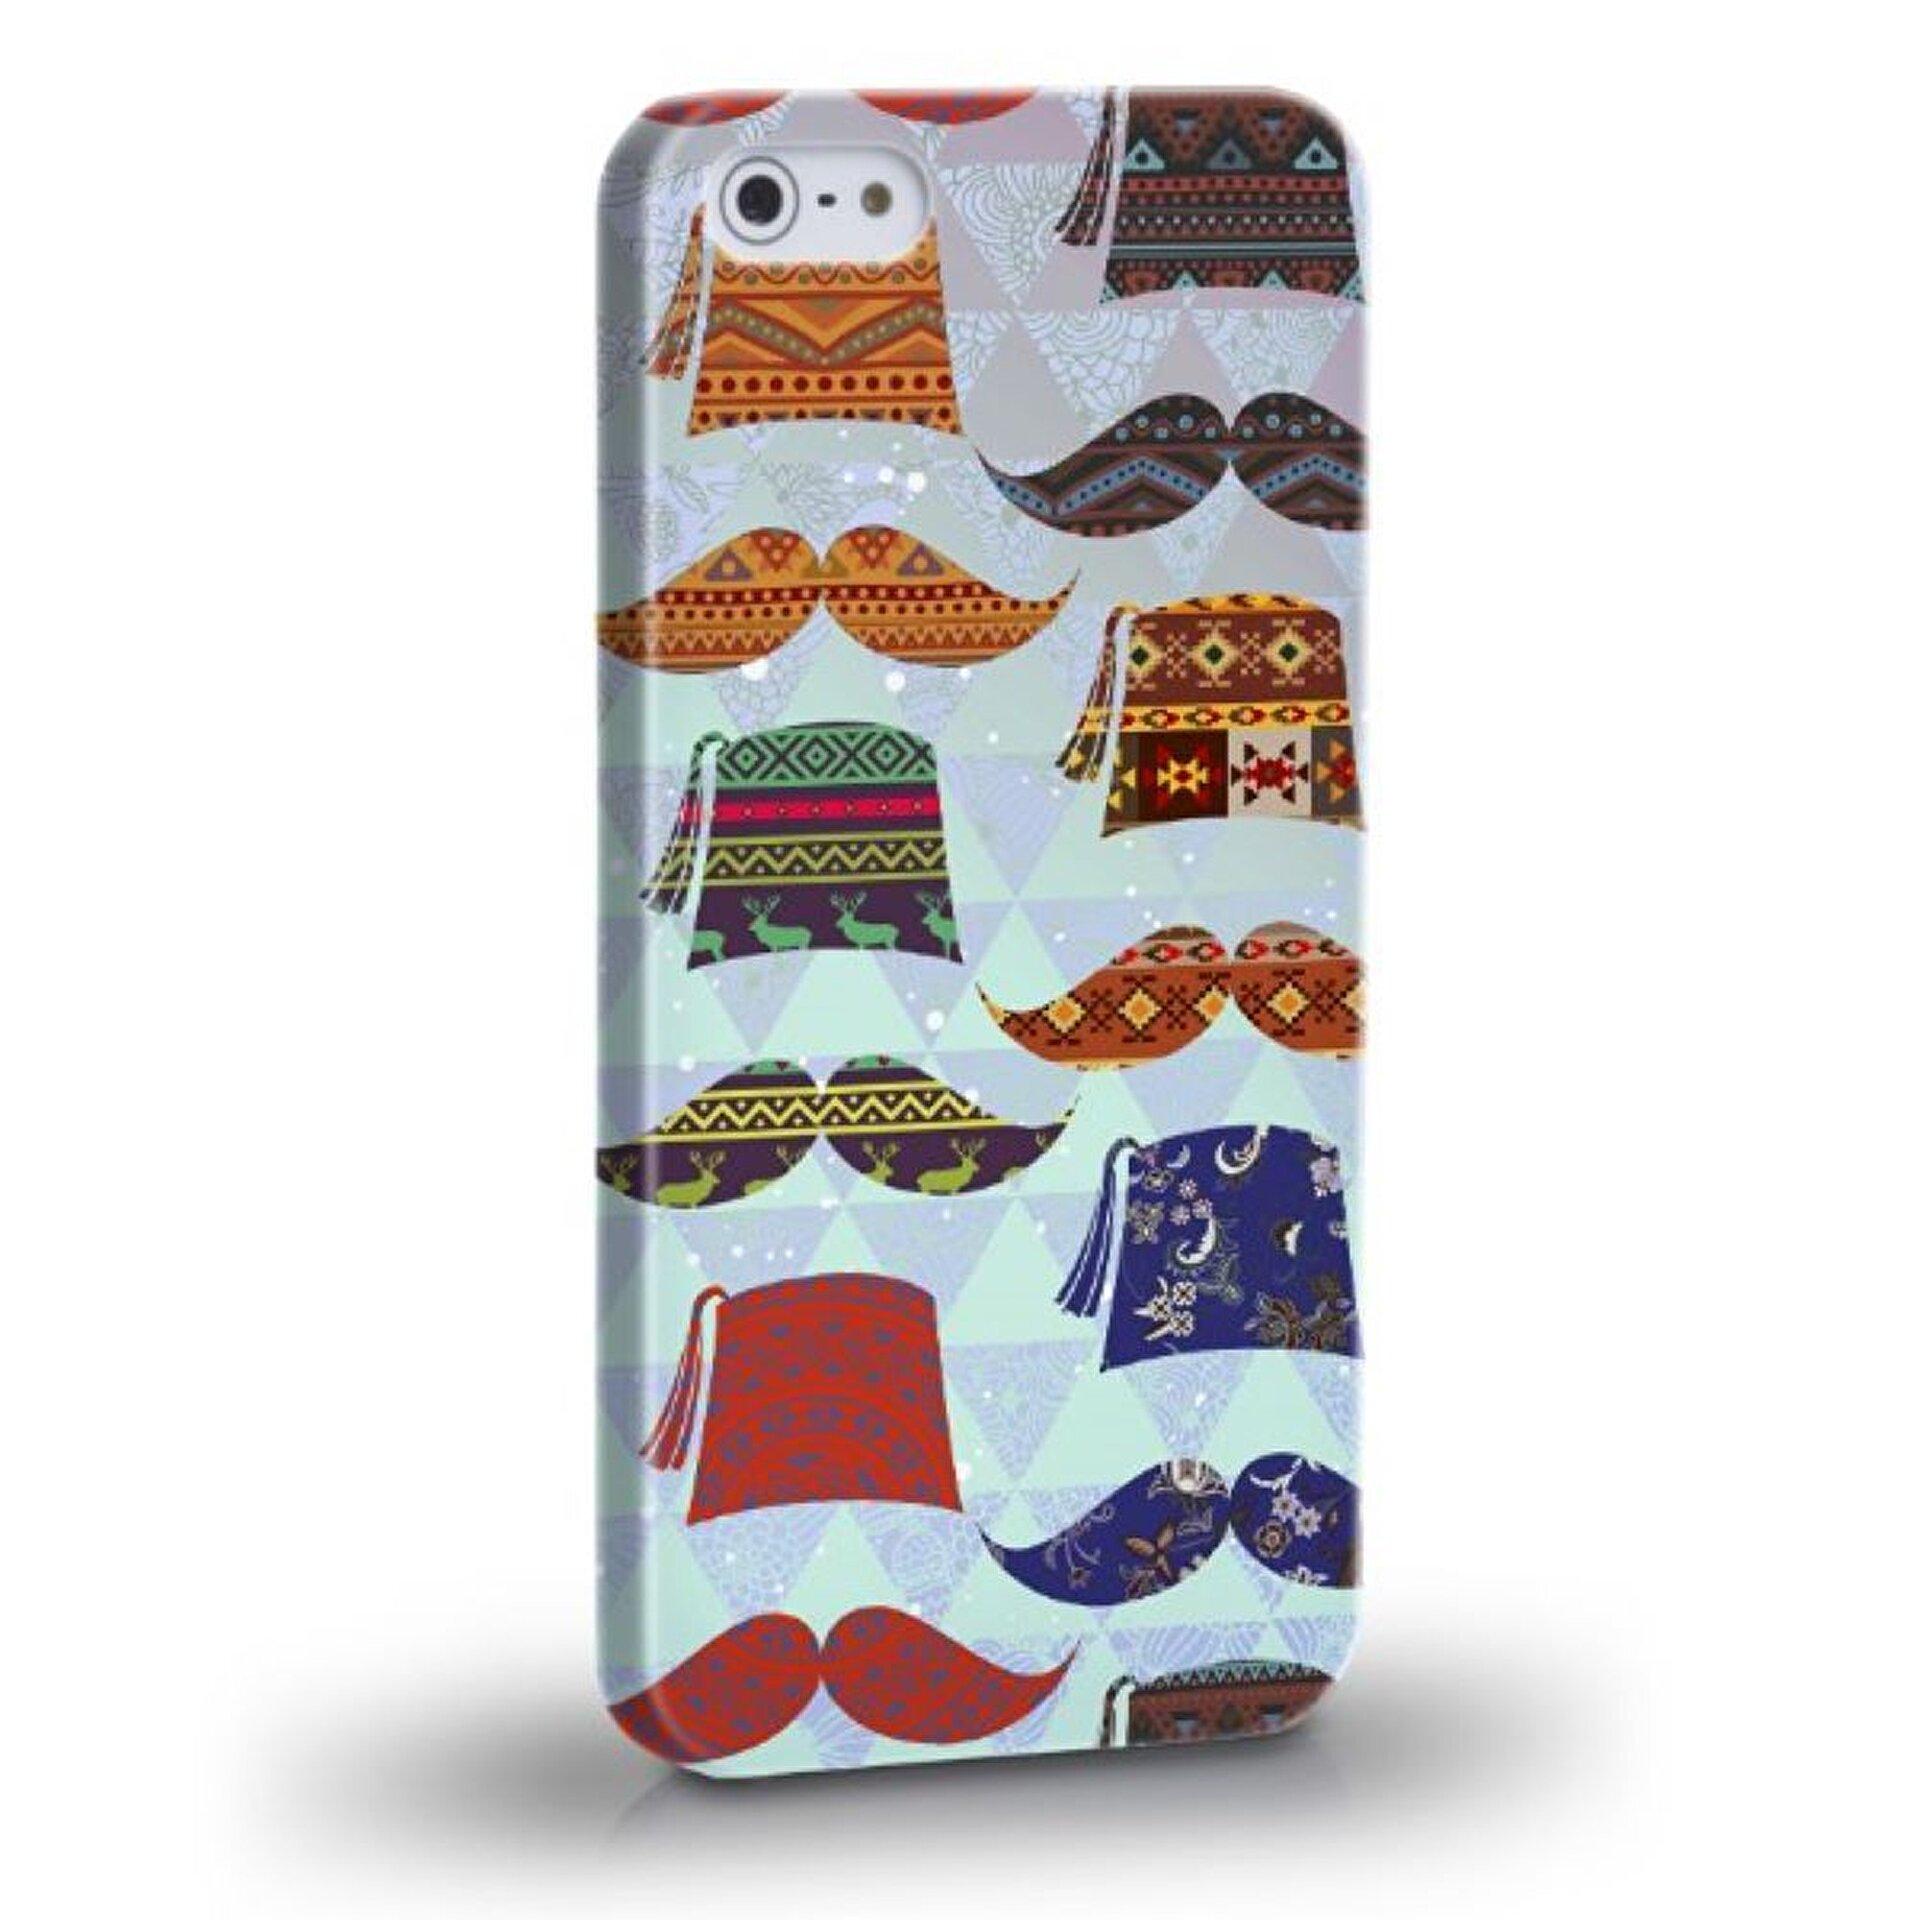 Picture of Biggdesign Bıyık iPhone 4/4S Kapak - Model - İPHONE 5/5S